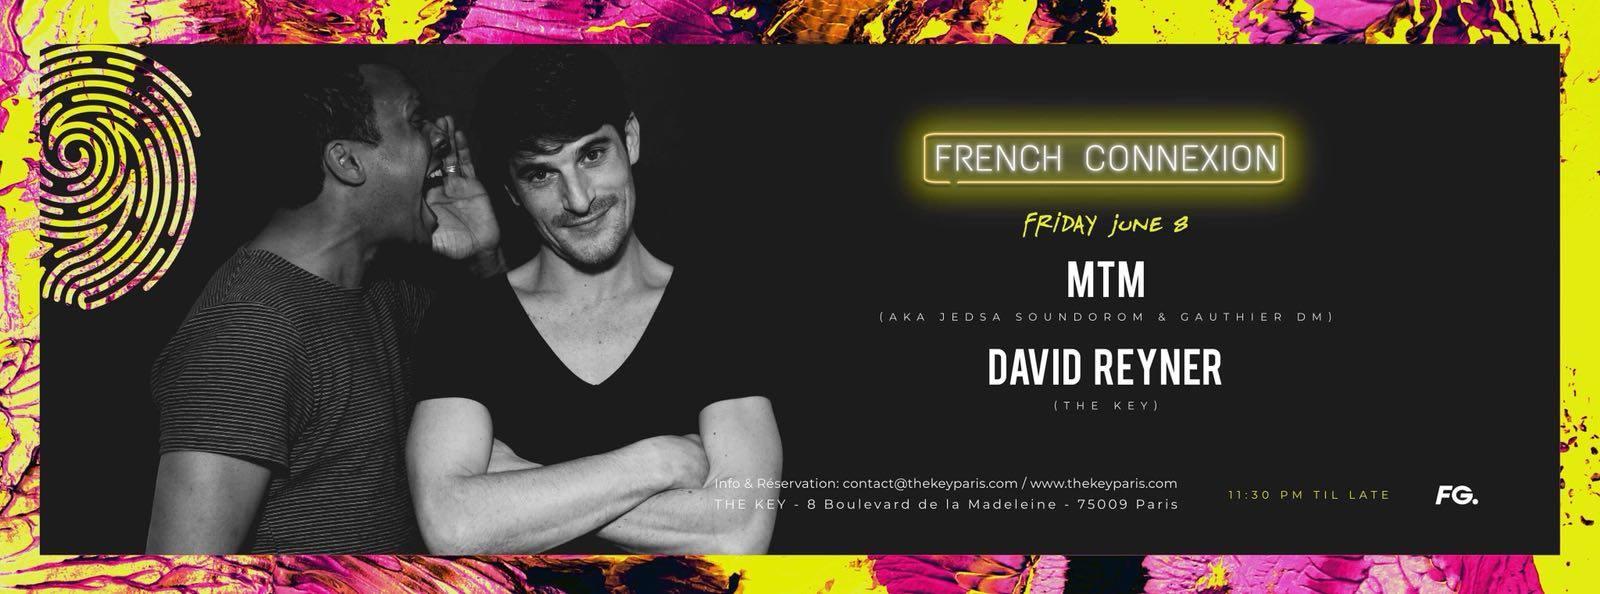 The Key x French Connexion : MTM, David Reyner